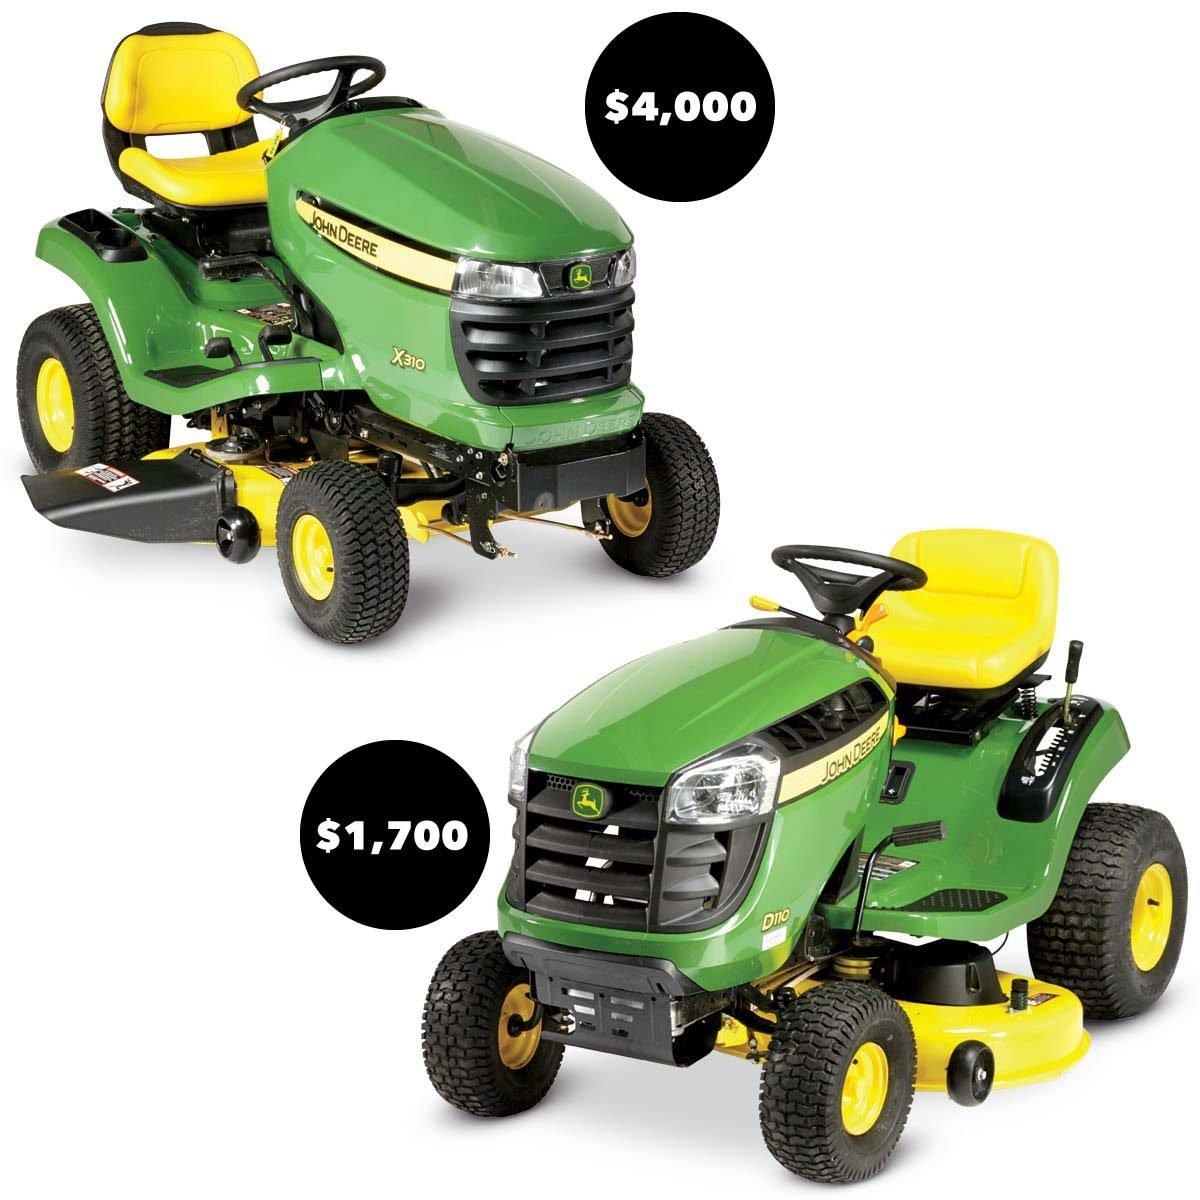 riding lawn mowers basic vs. loaded comparison